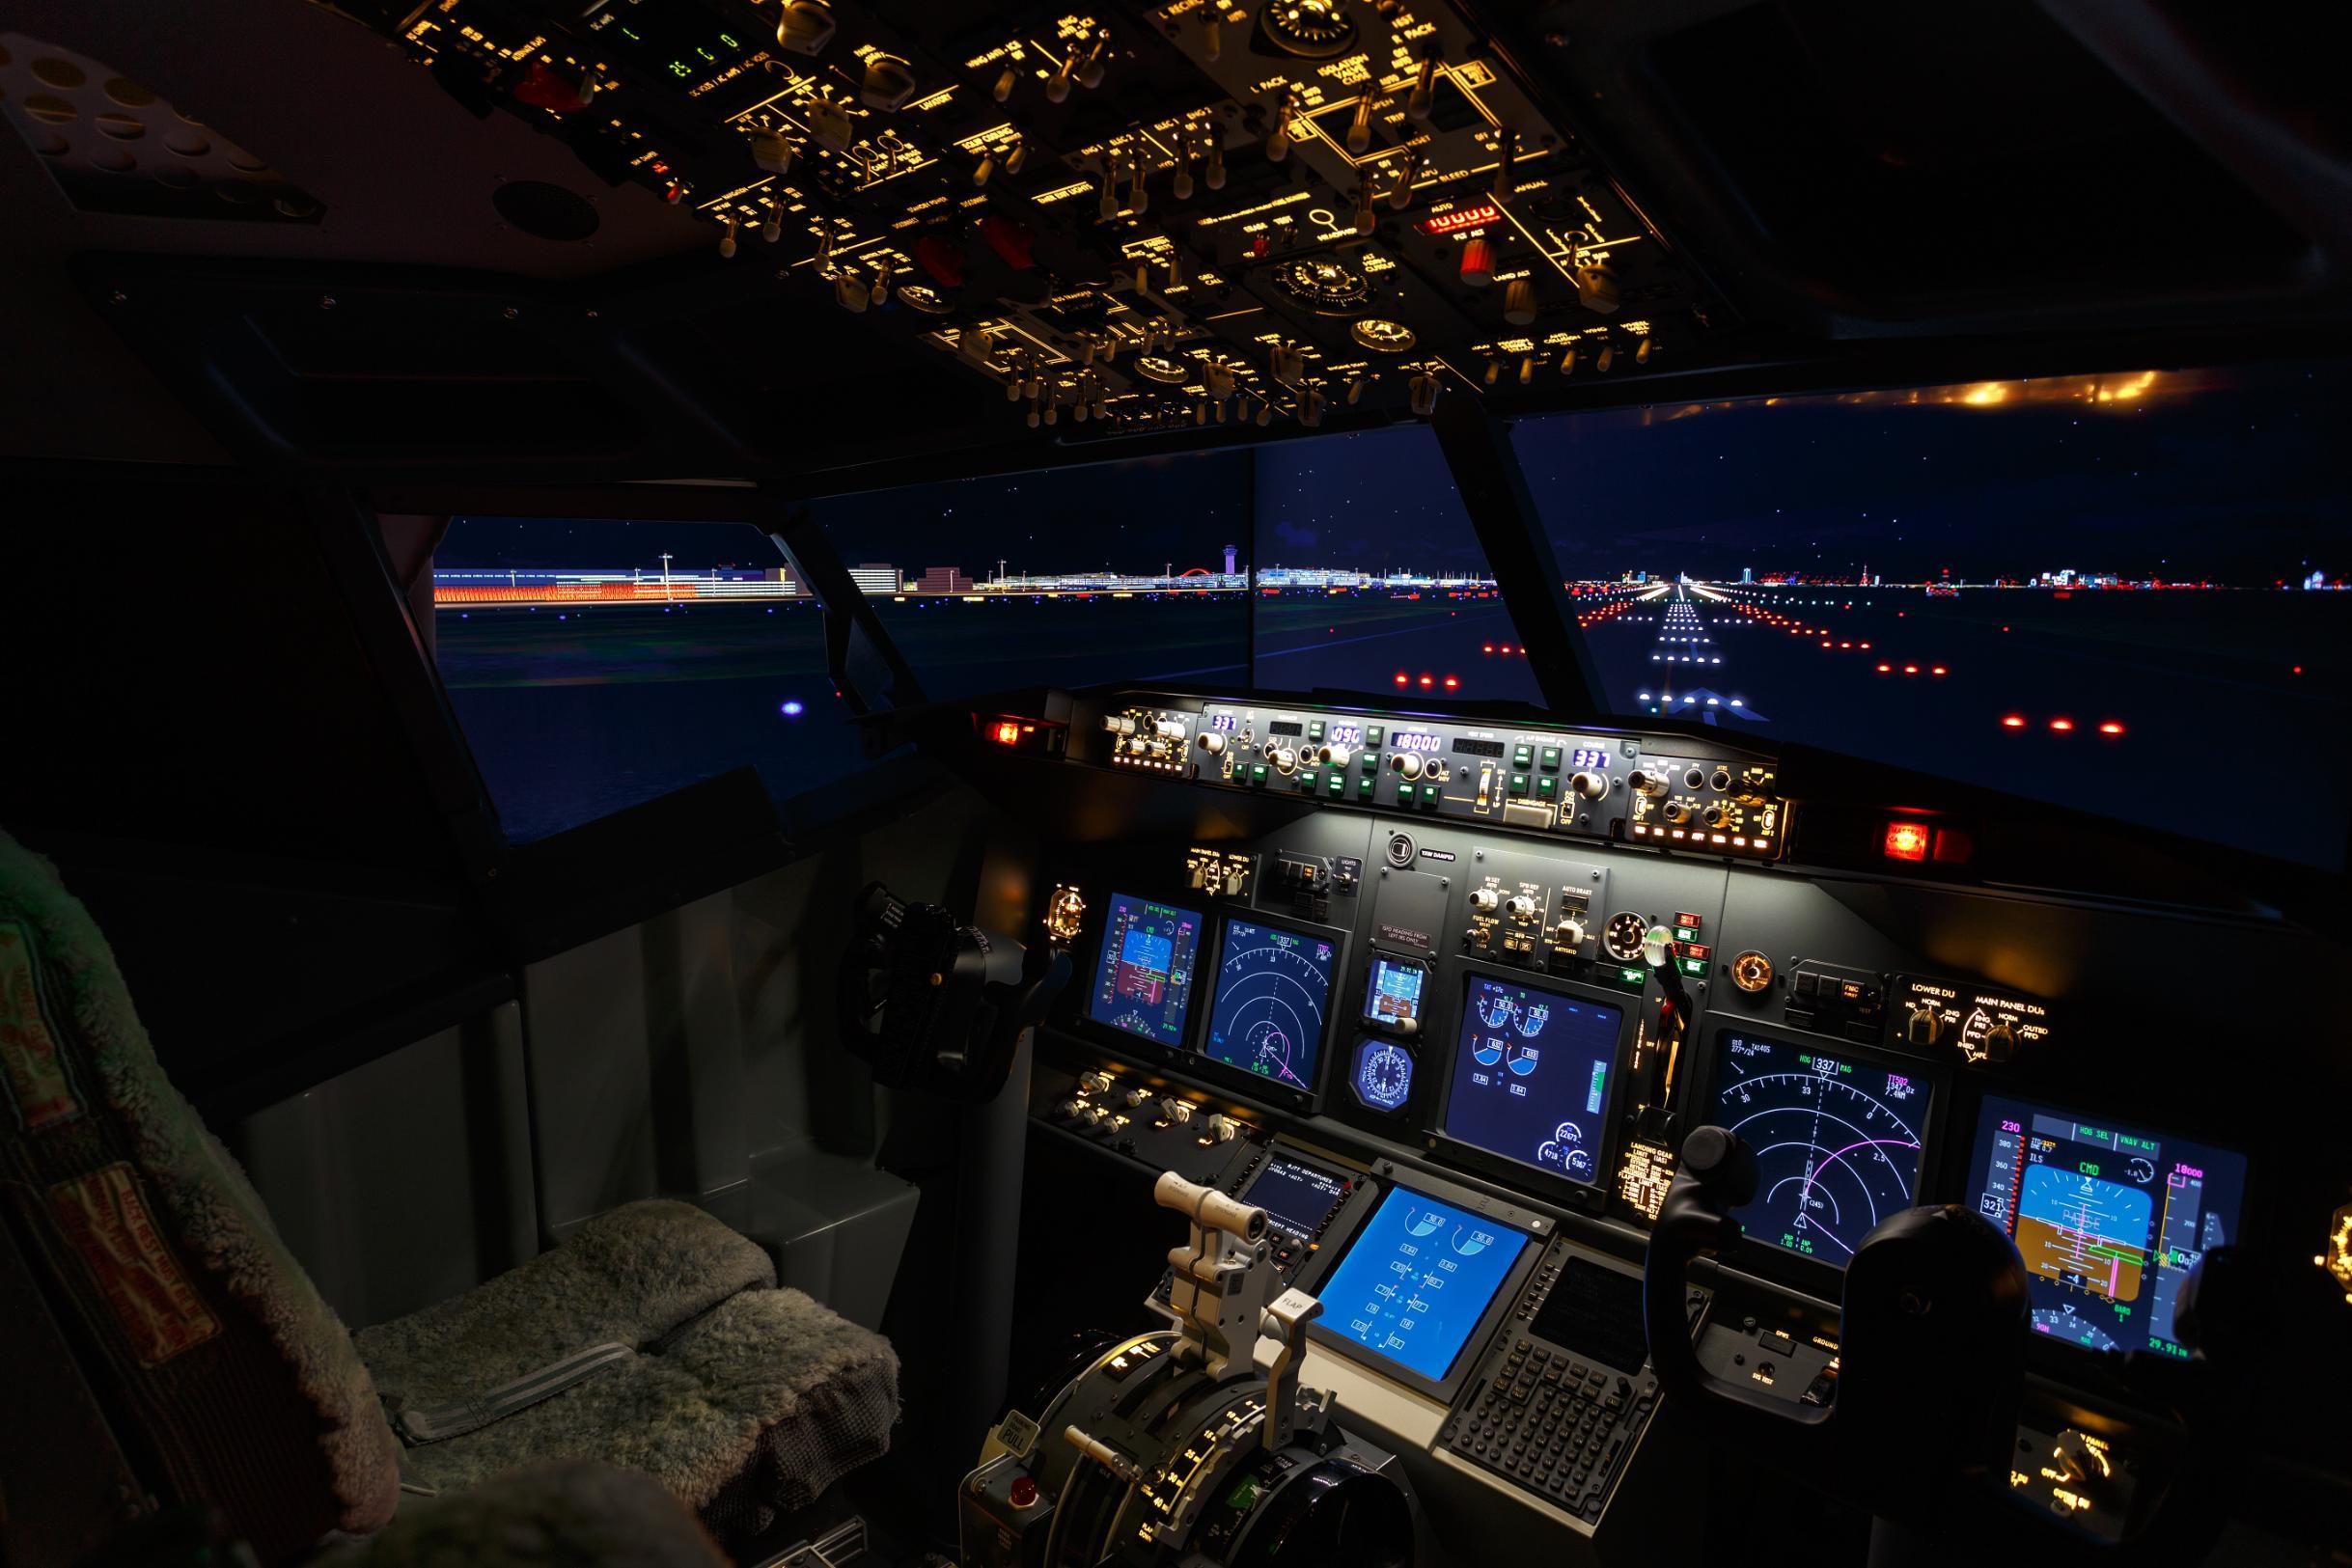 Japanese airport hotel puts flight simulator in room   CNN